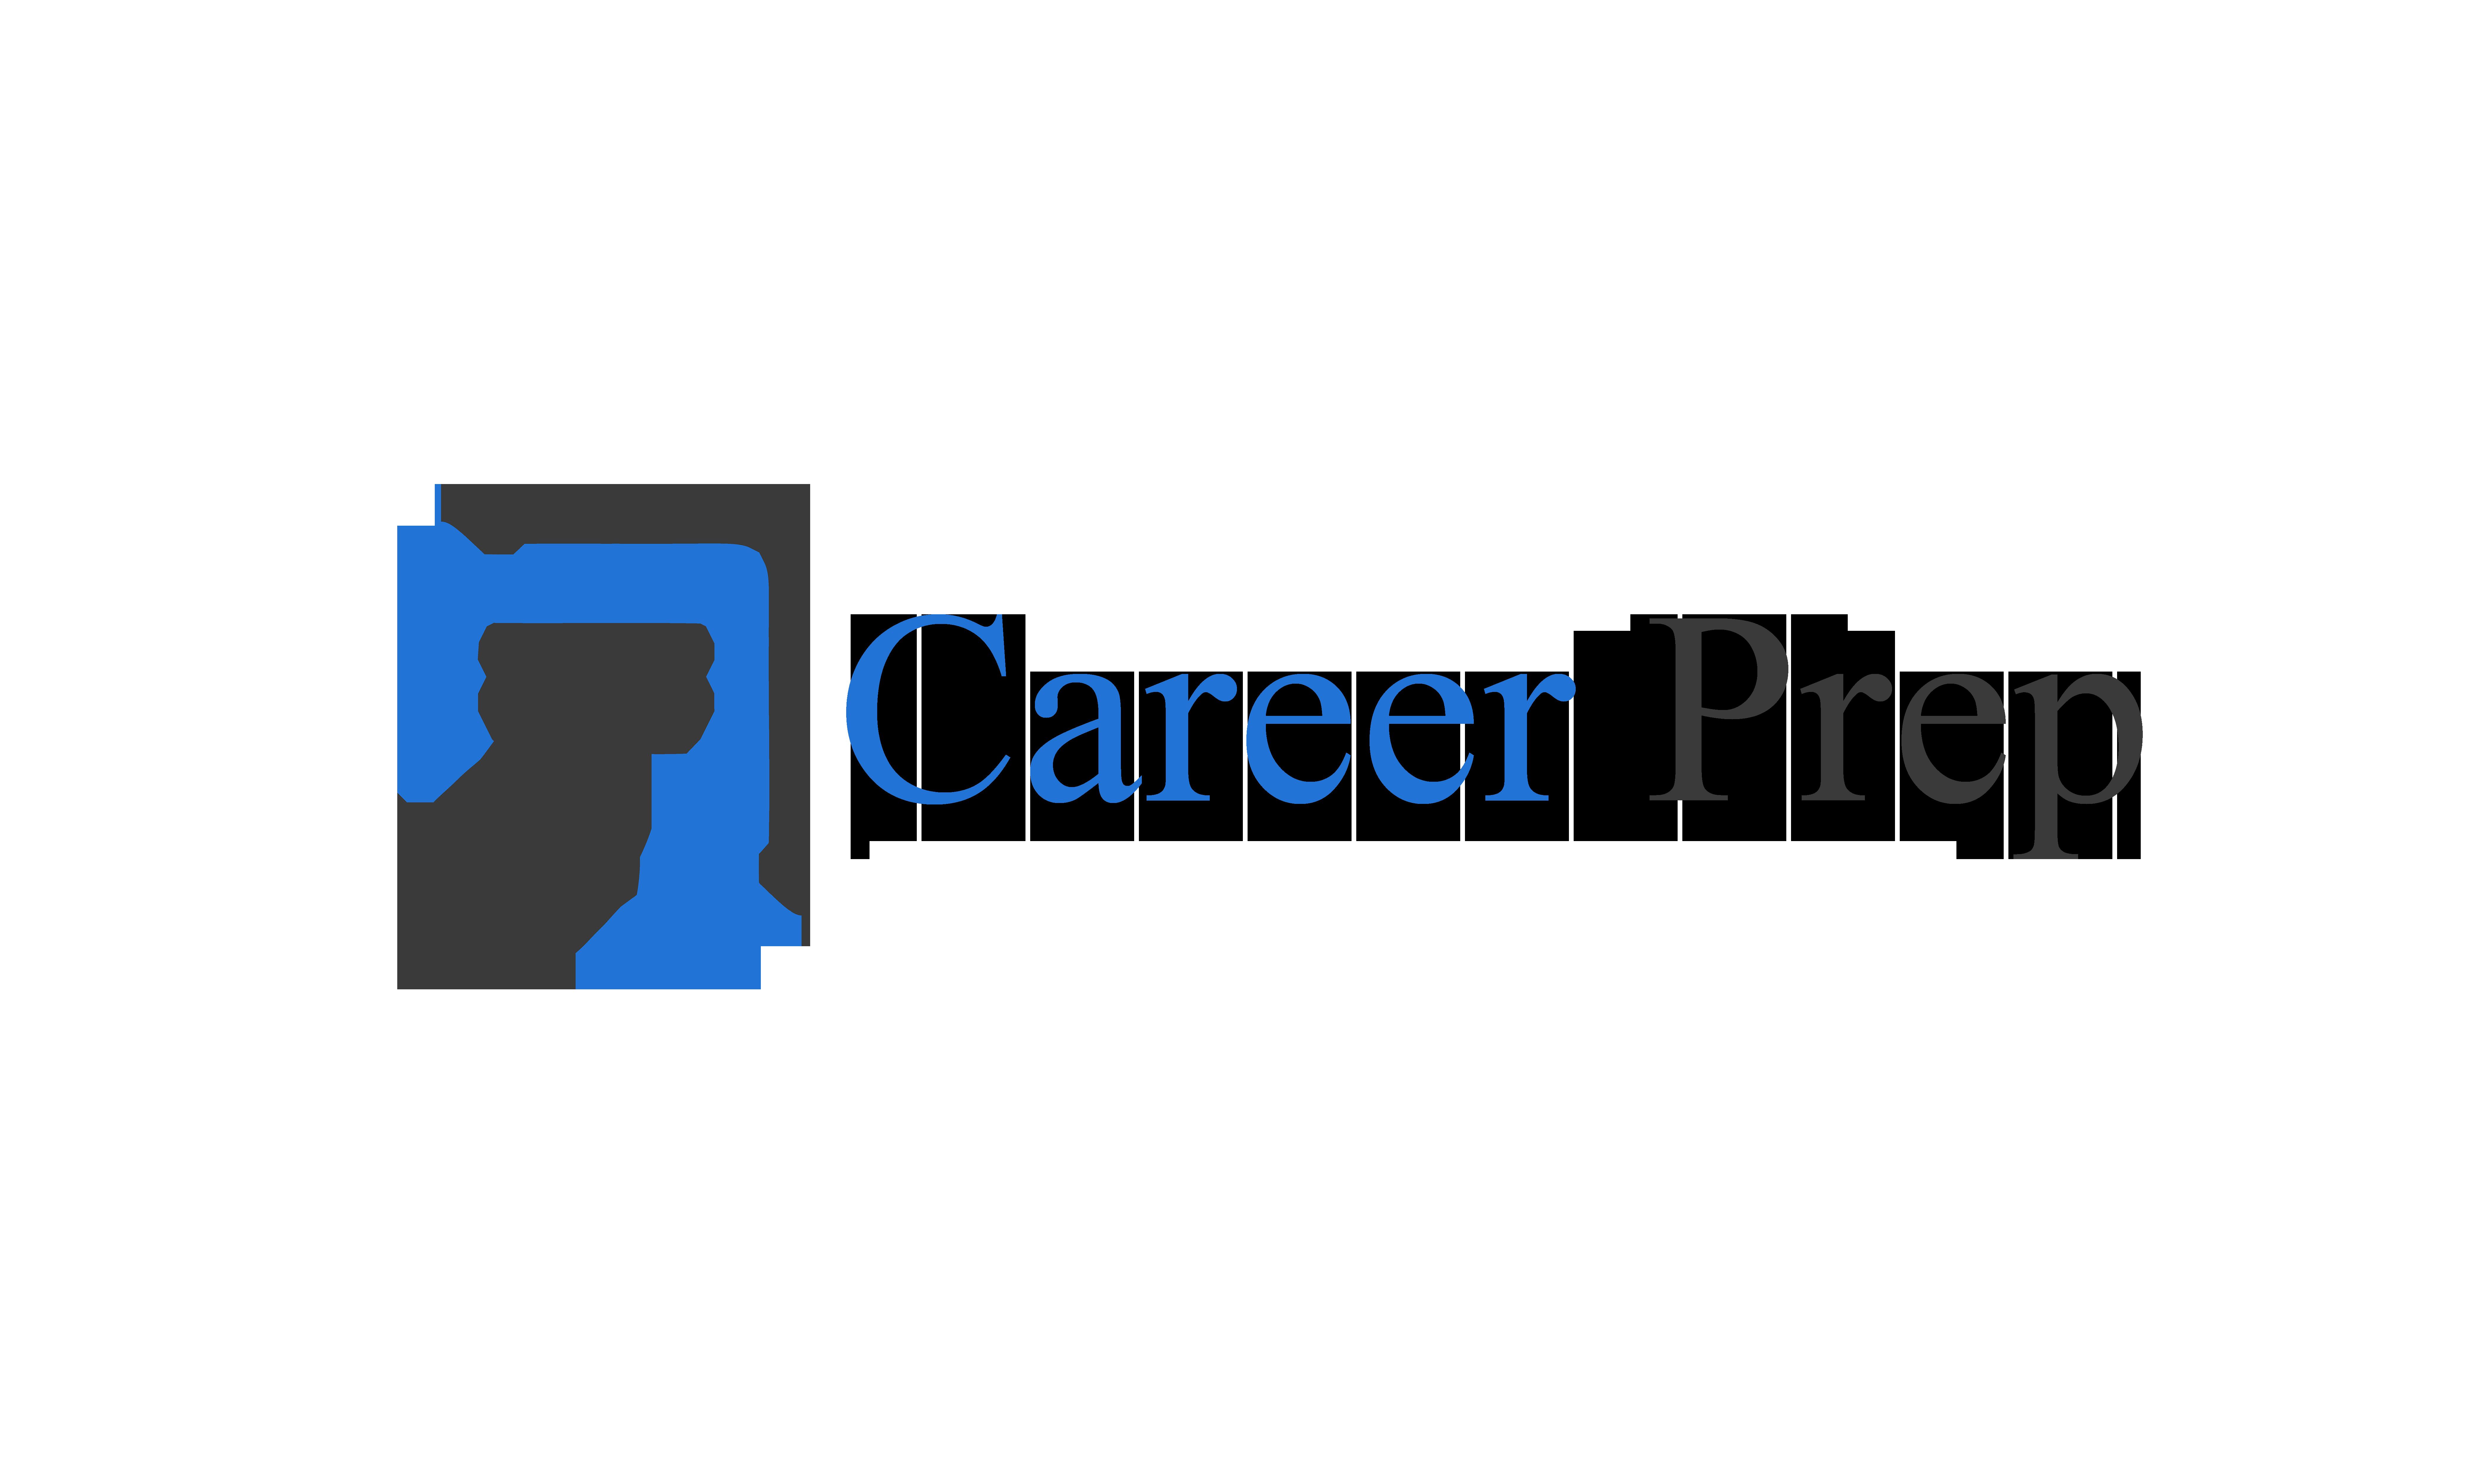 Career prep - logo